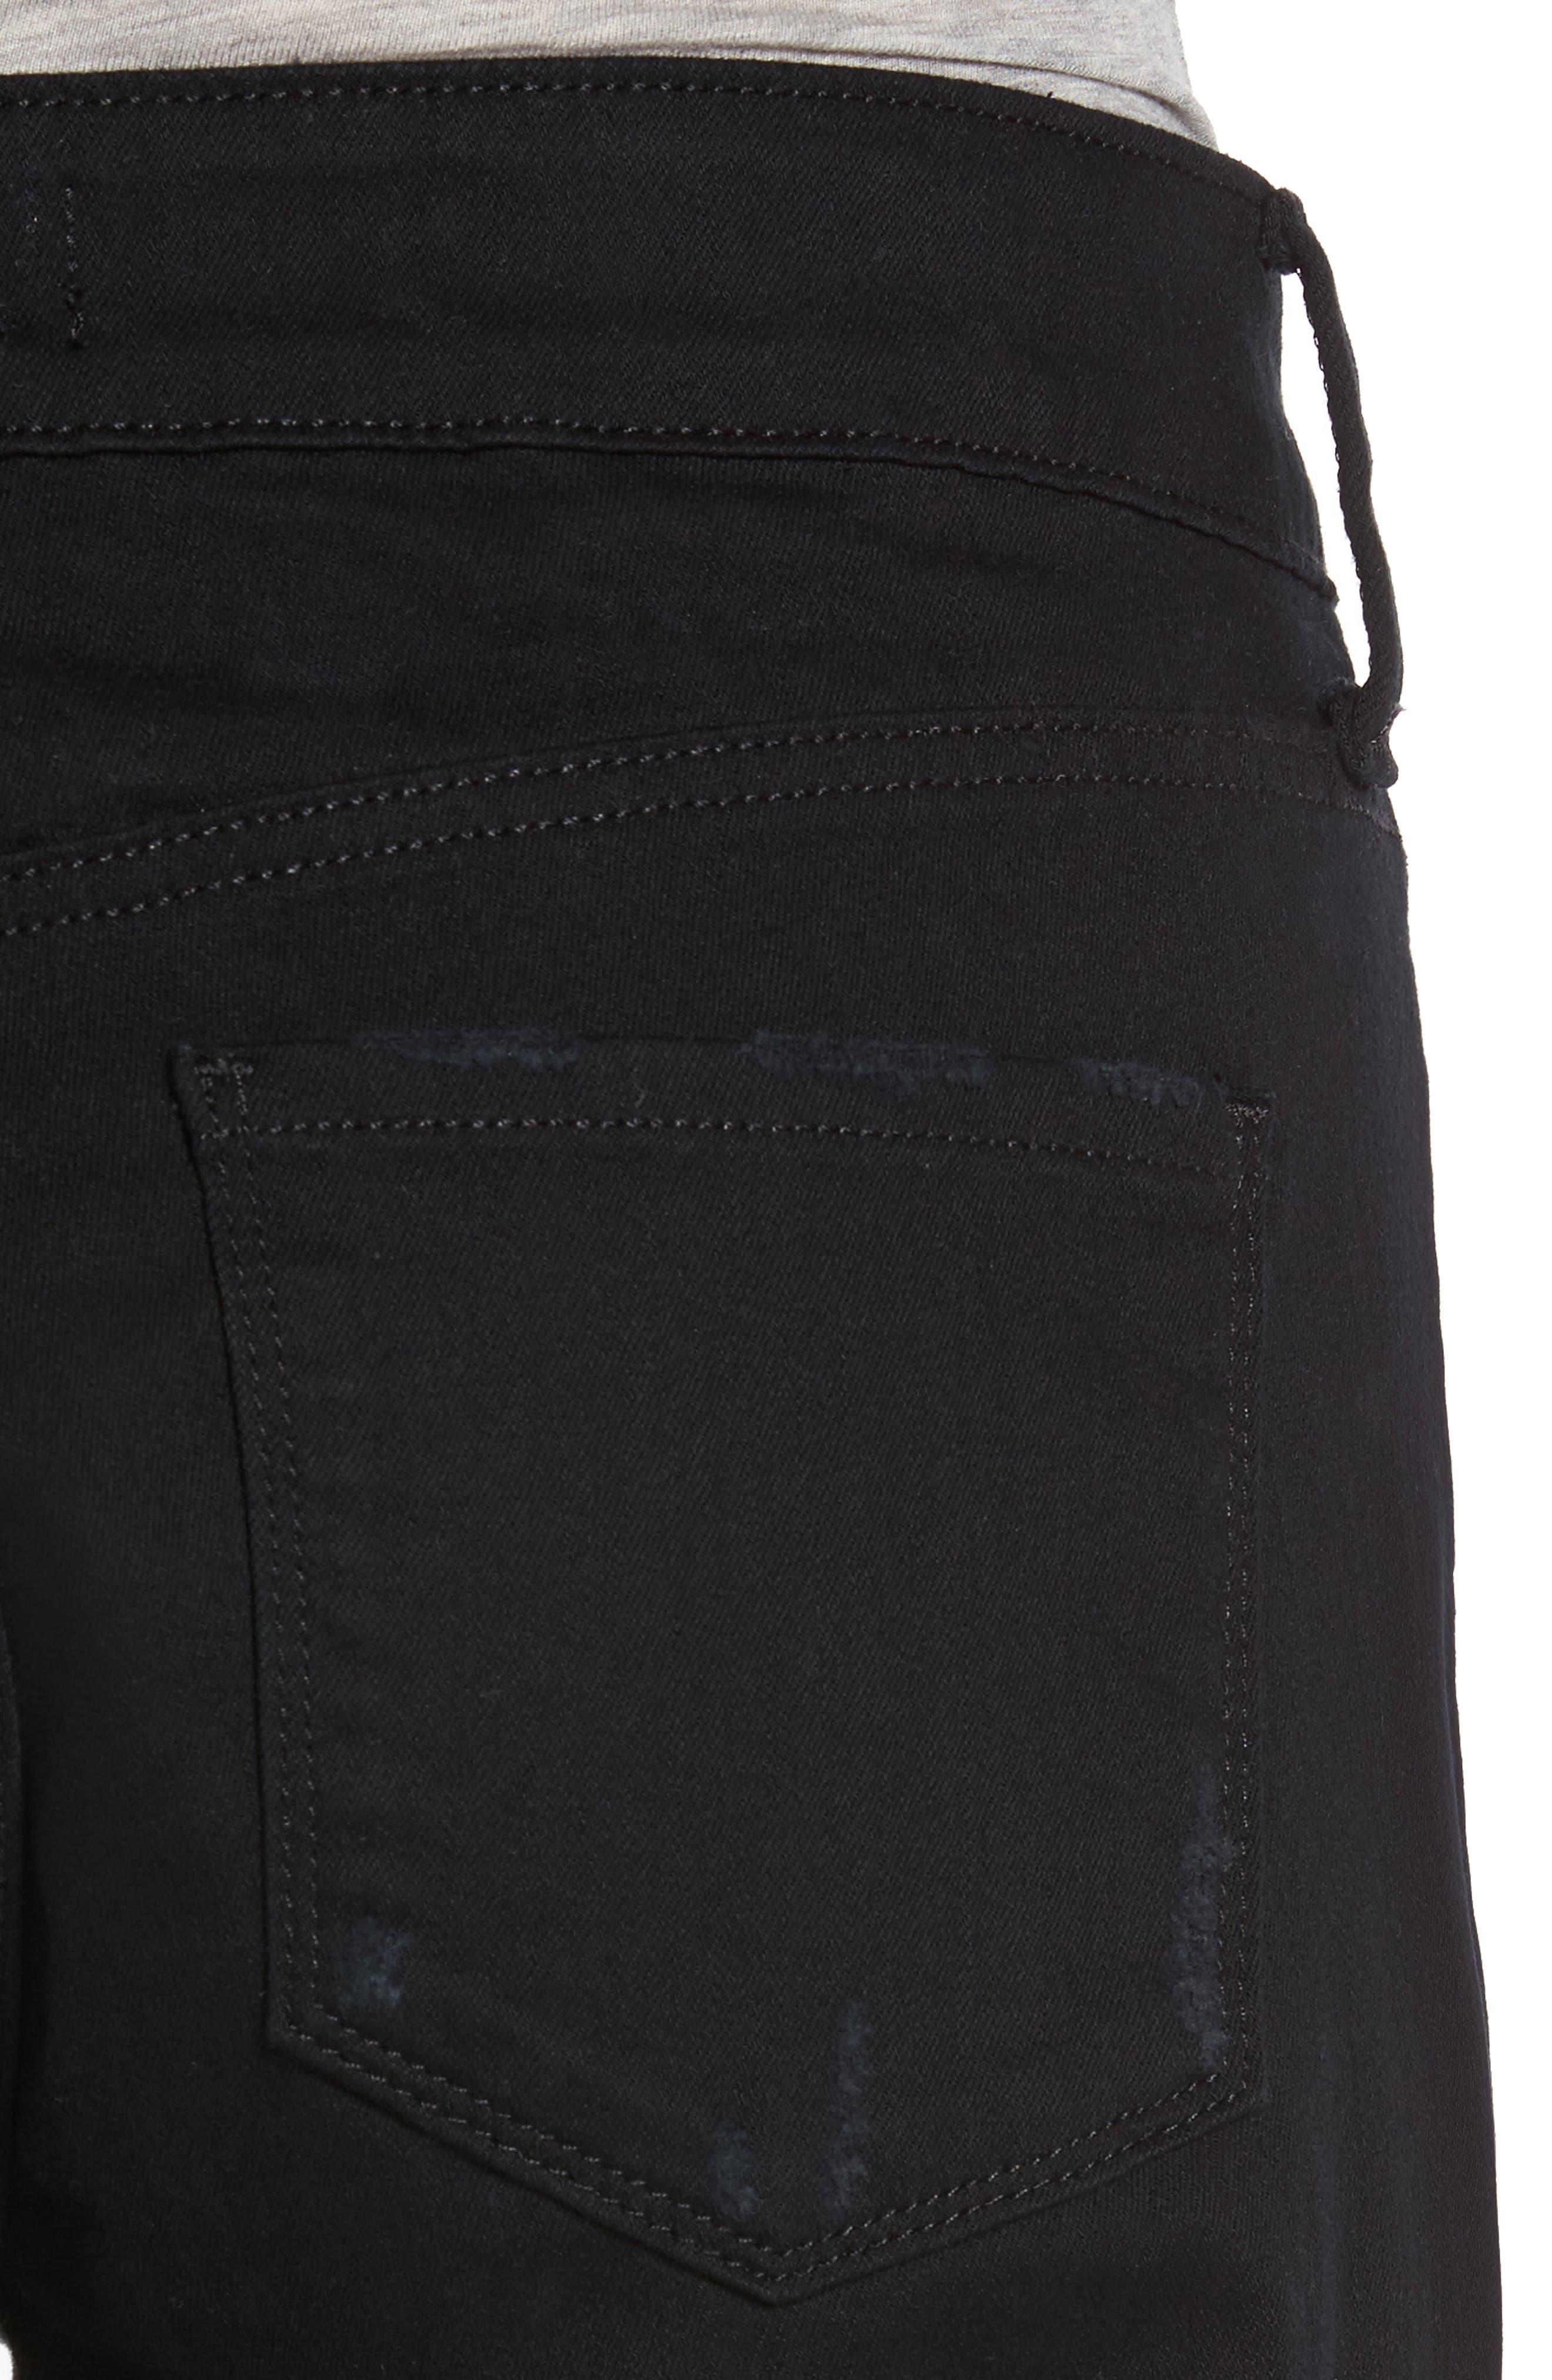 Jessica Destructed Stretch Boyfriend Jeans,                             Alternate thumbnail 4, color,                             001